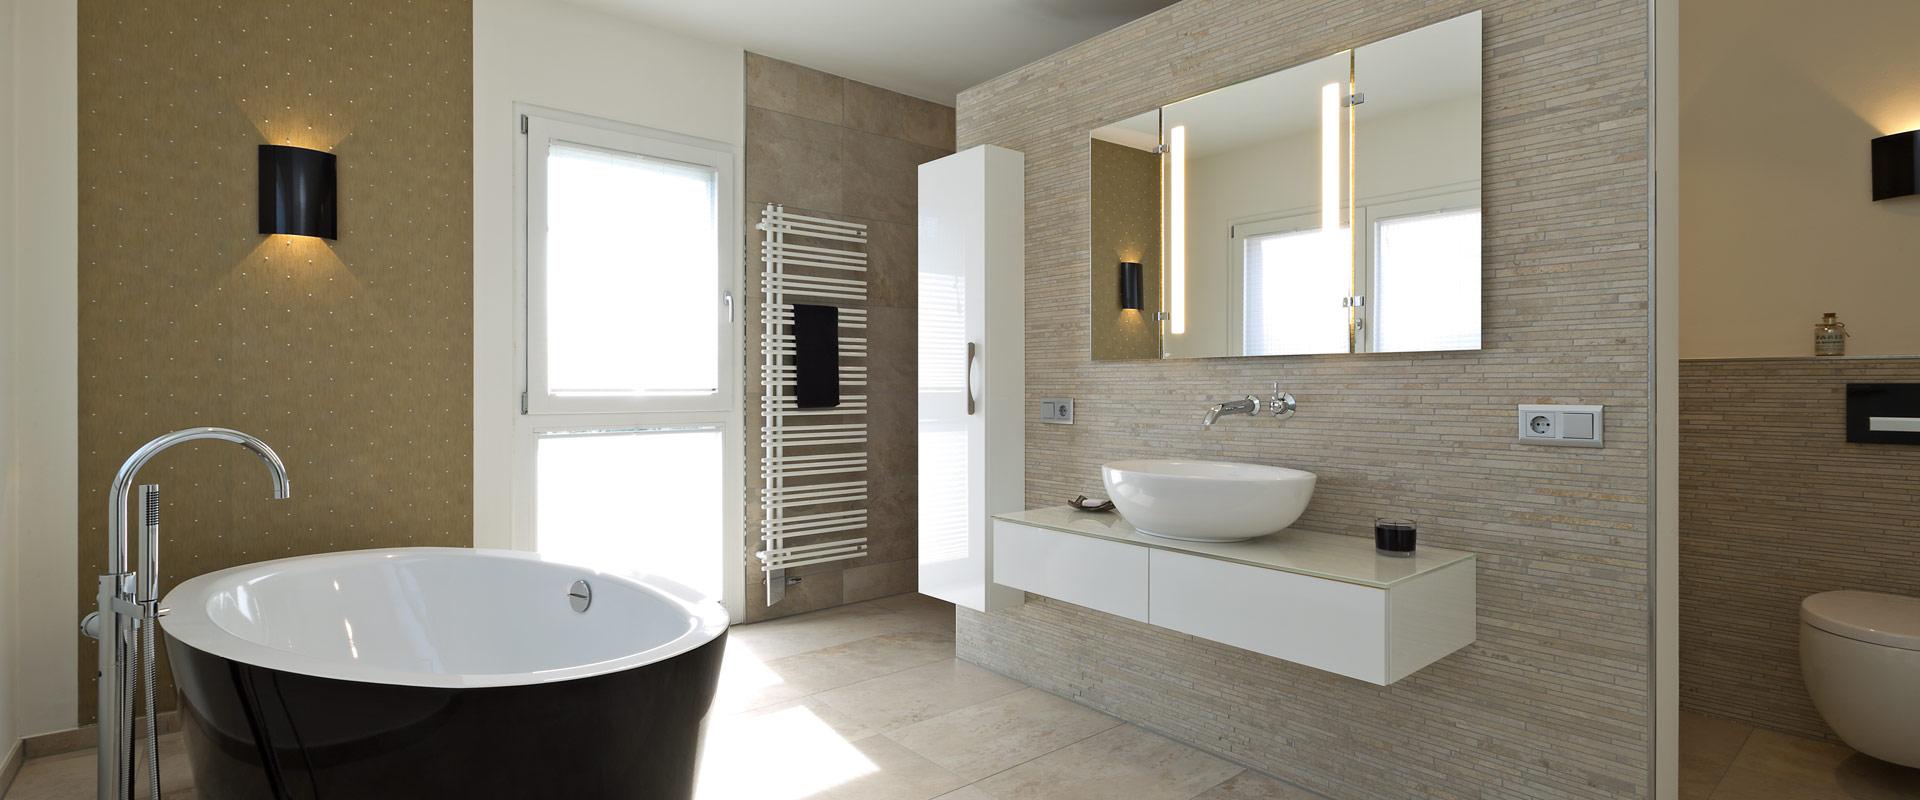 badtraum gmbh - - video traumbad auf 6 quadratmetern -, Badezimmer ideen